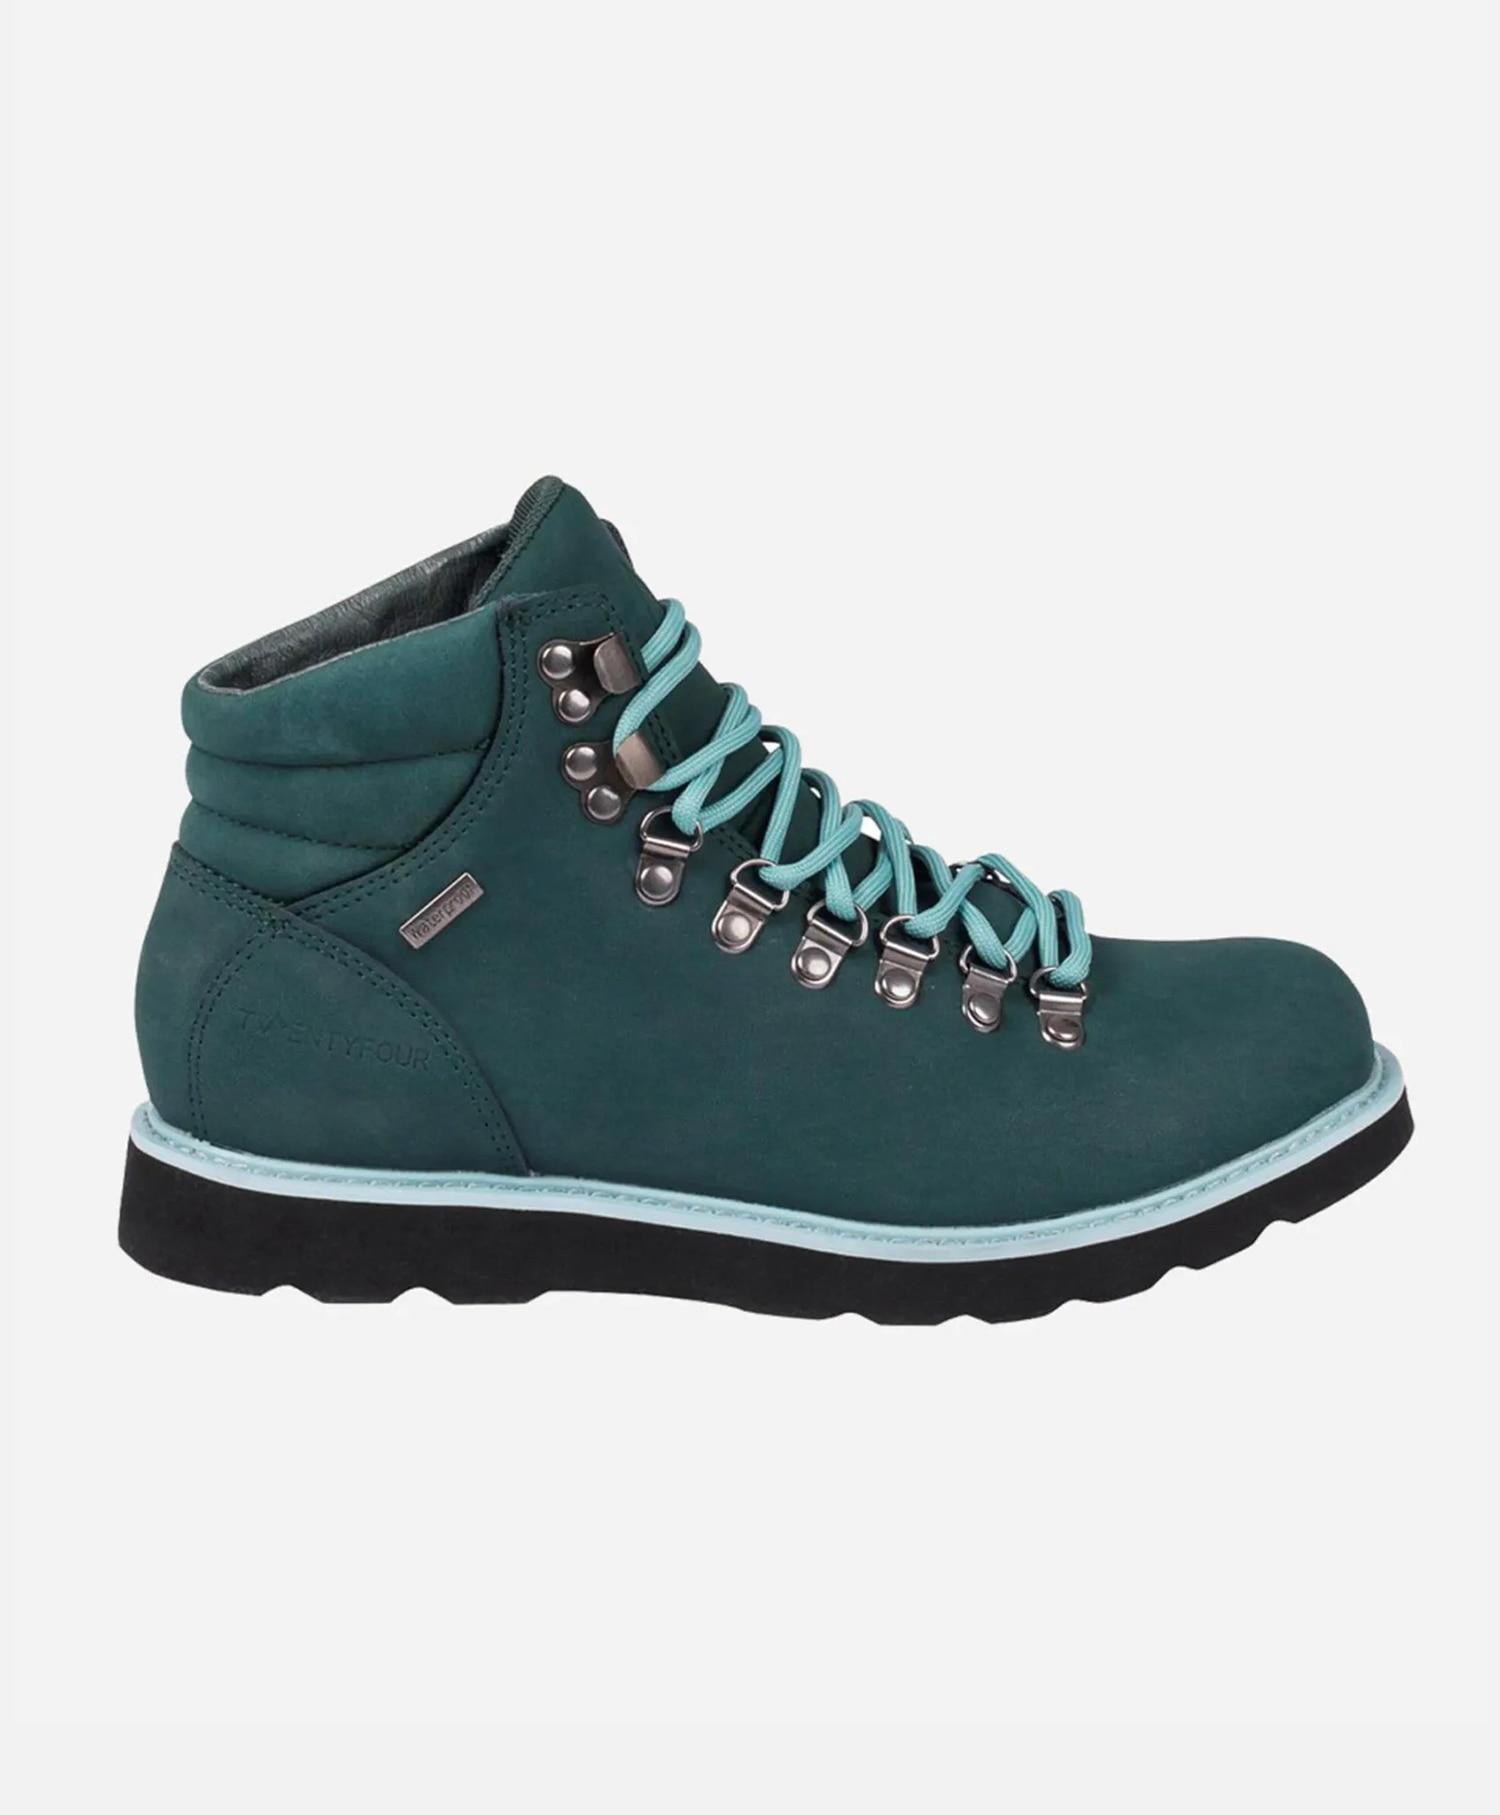 Twentyfour Finse Dalen boot